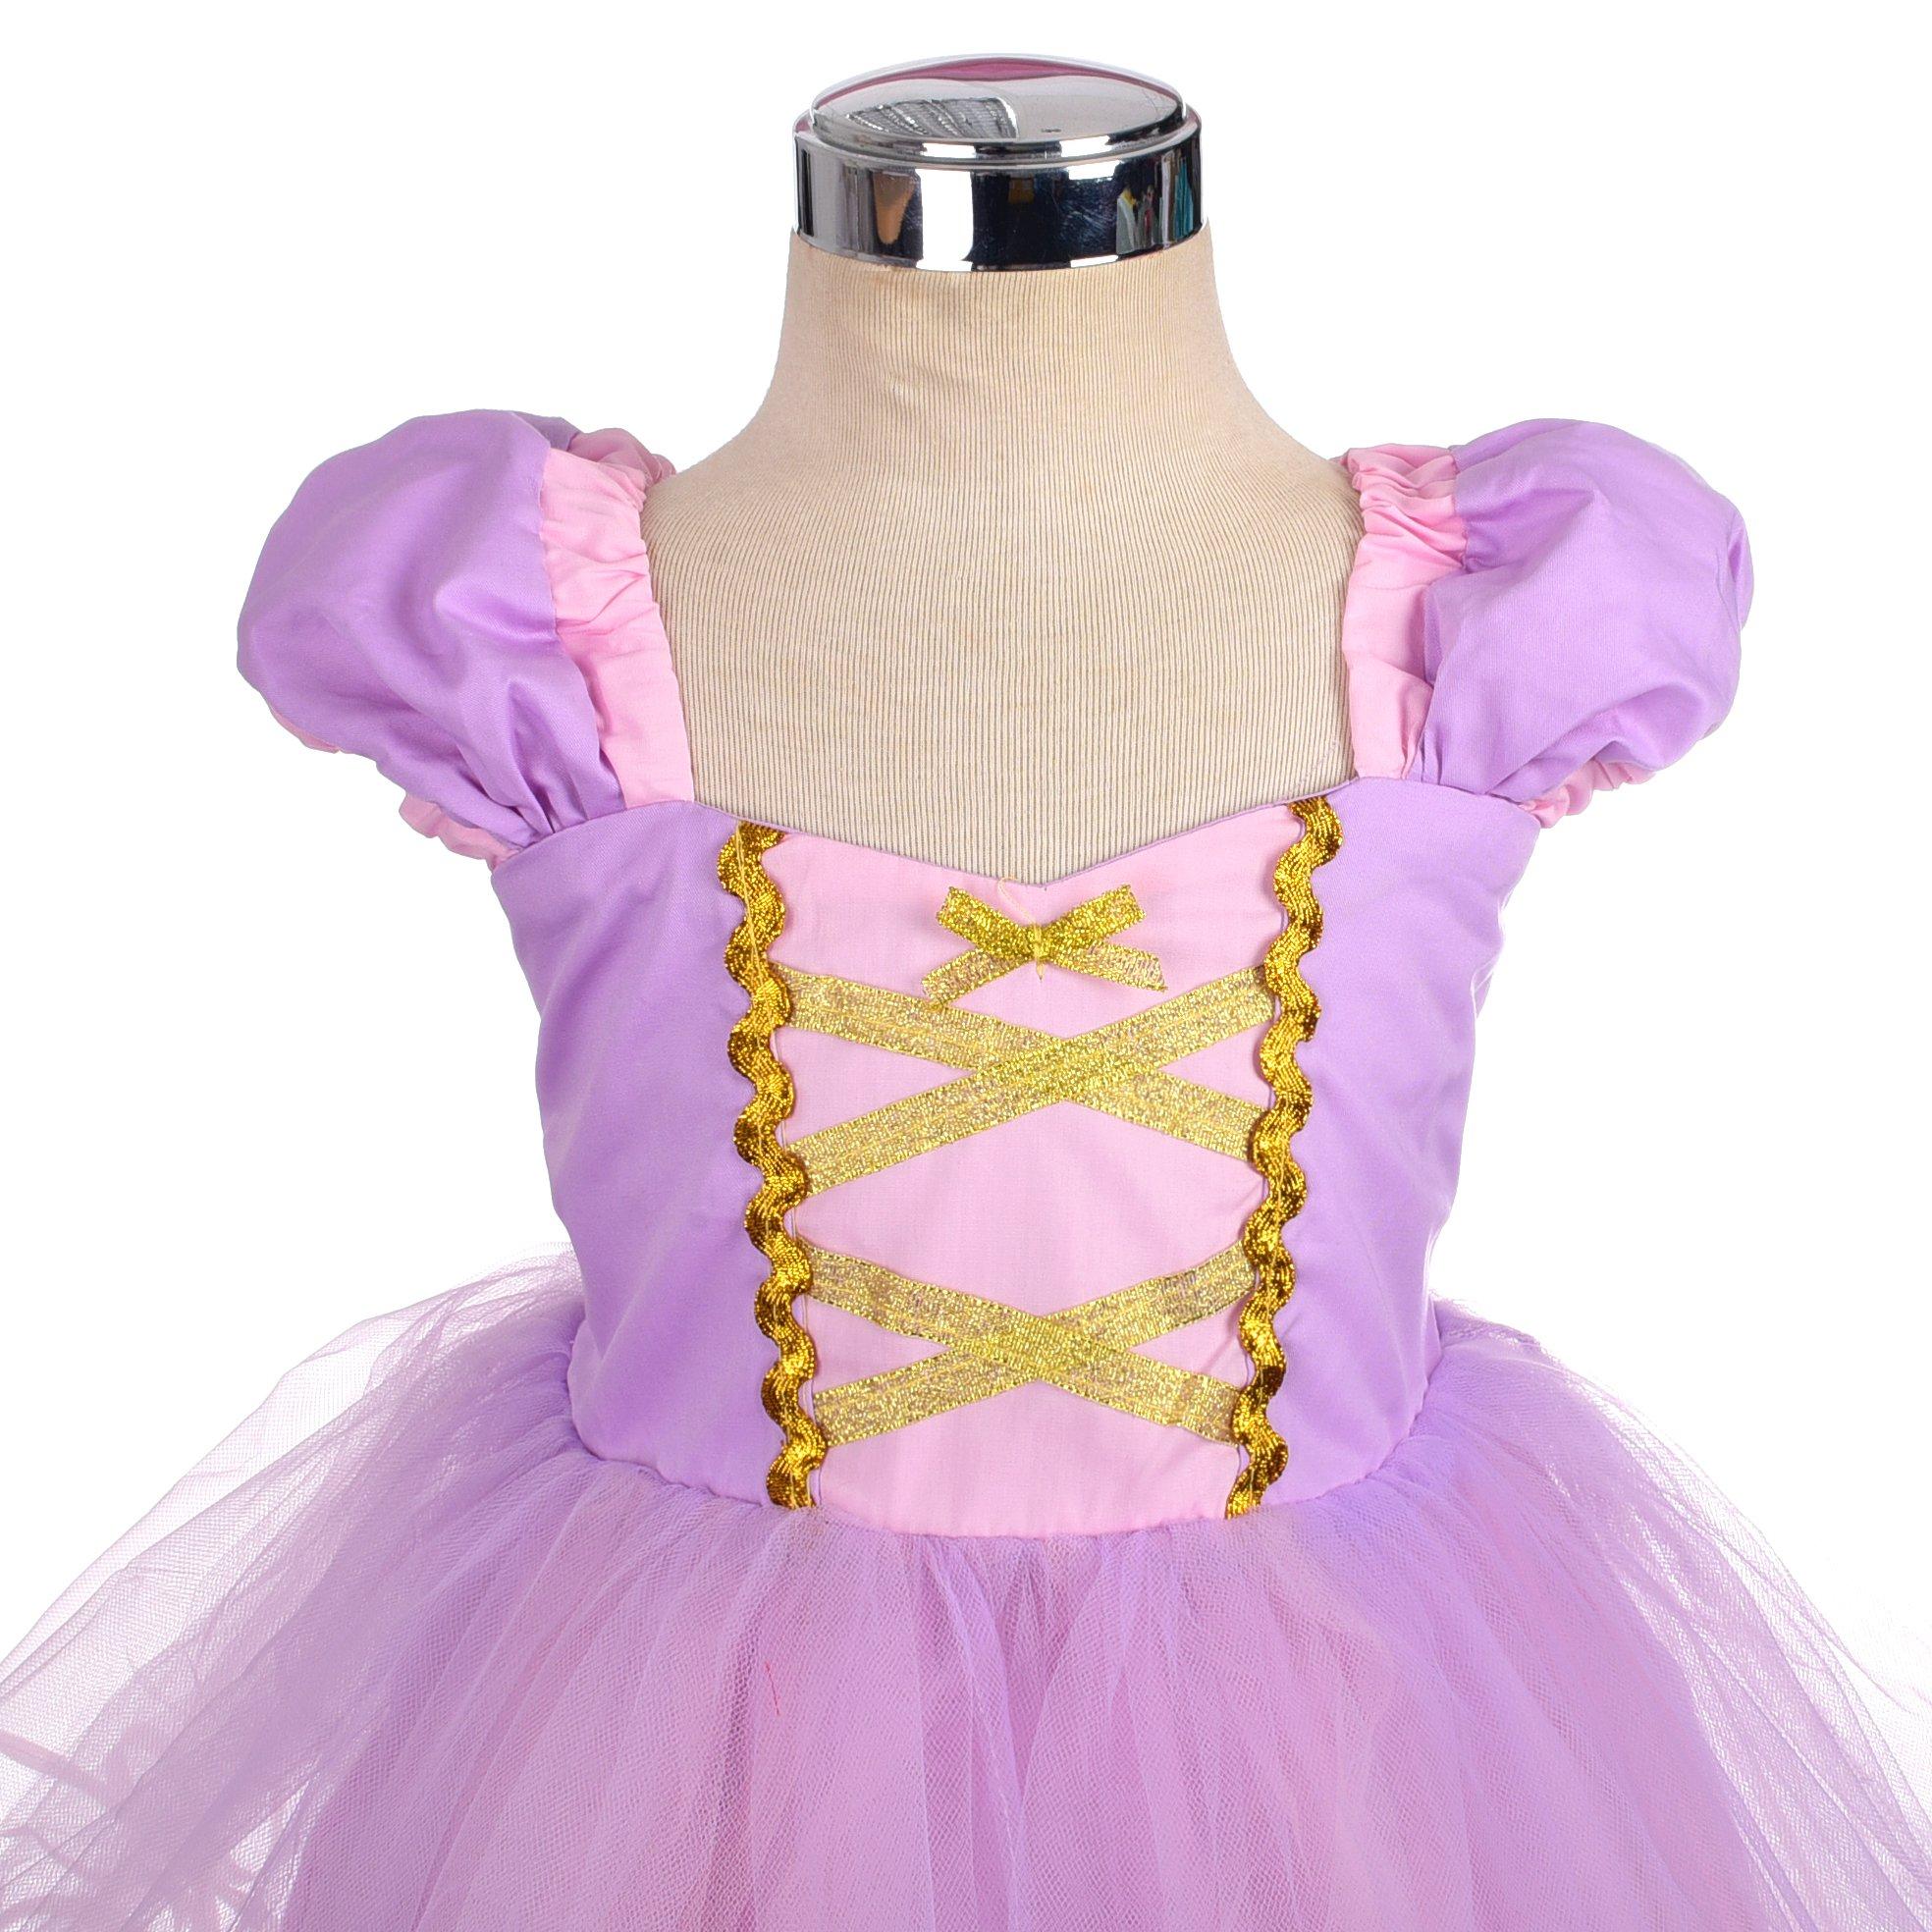 Dressy Daisy Girls Princess Rapunzel Dress Costumes for Toddler Girls Halloween Fancy Party Dress Size 4T by Dressy Daisy (Image #4)